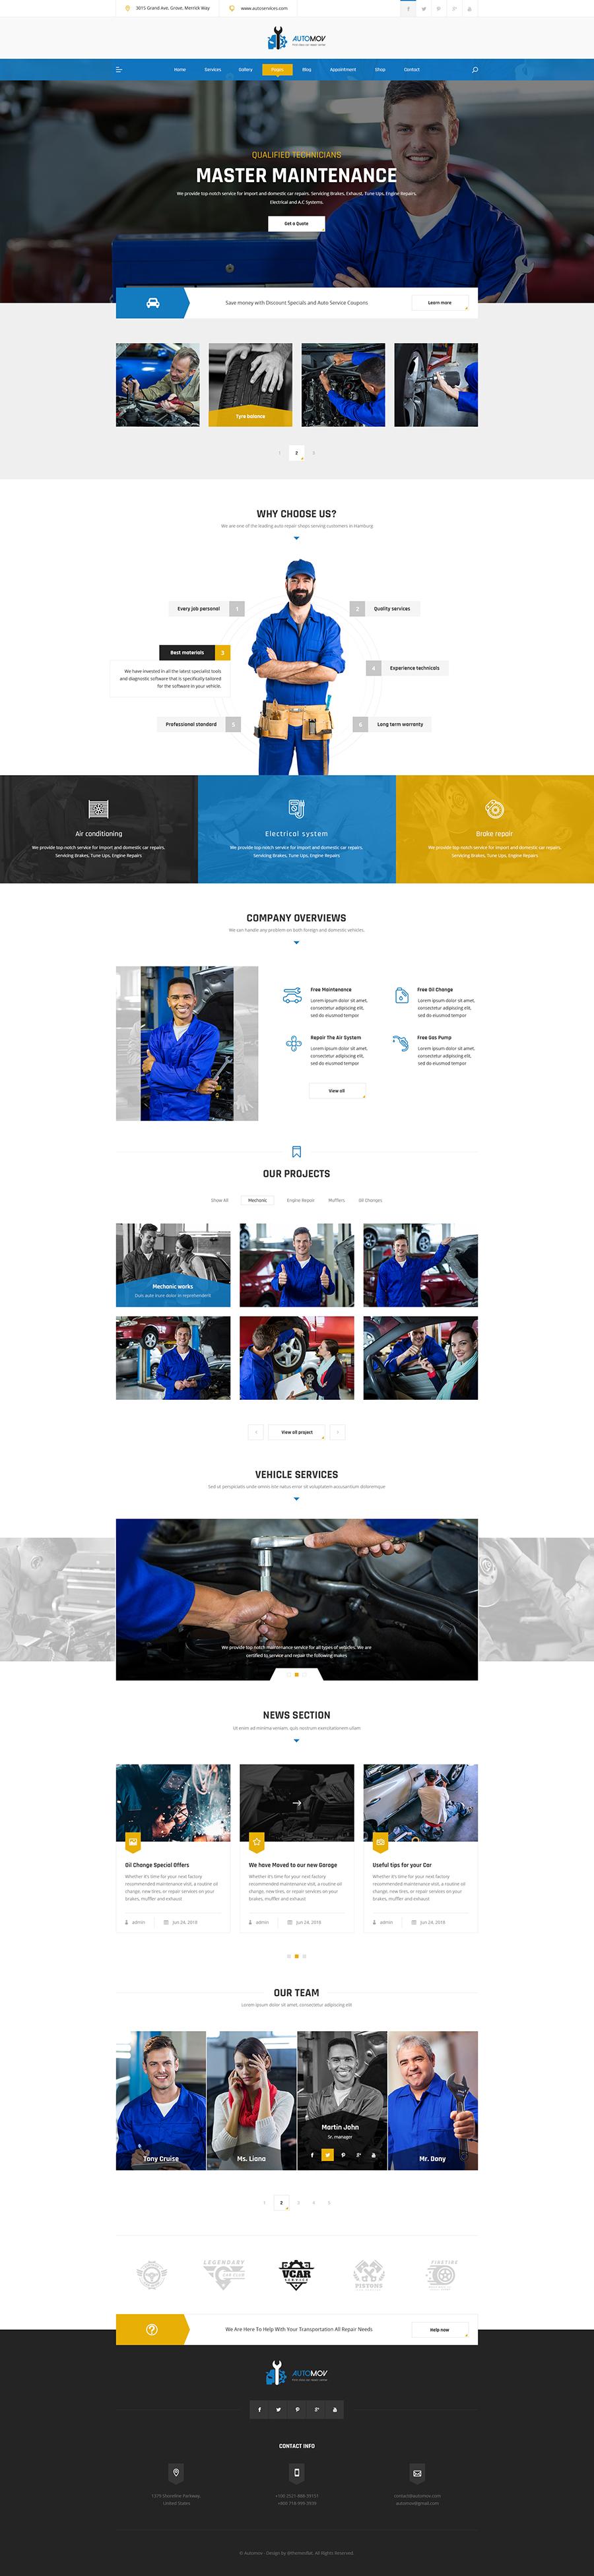 01-homepage-V1.jpg